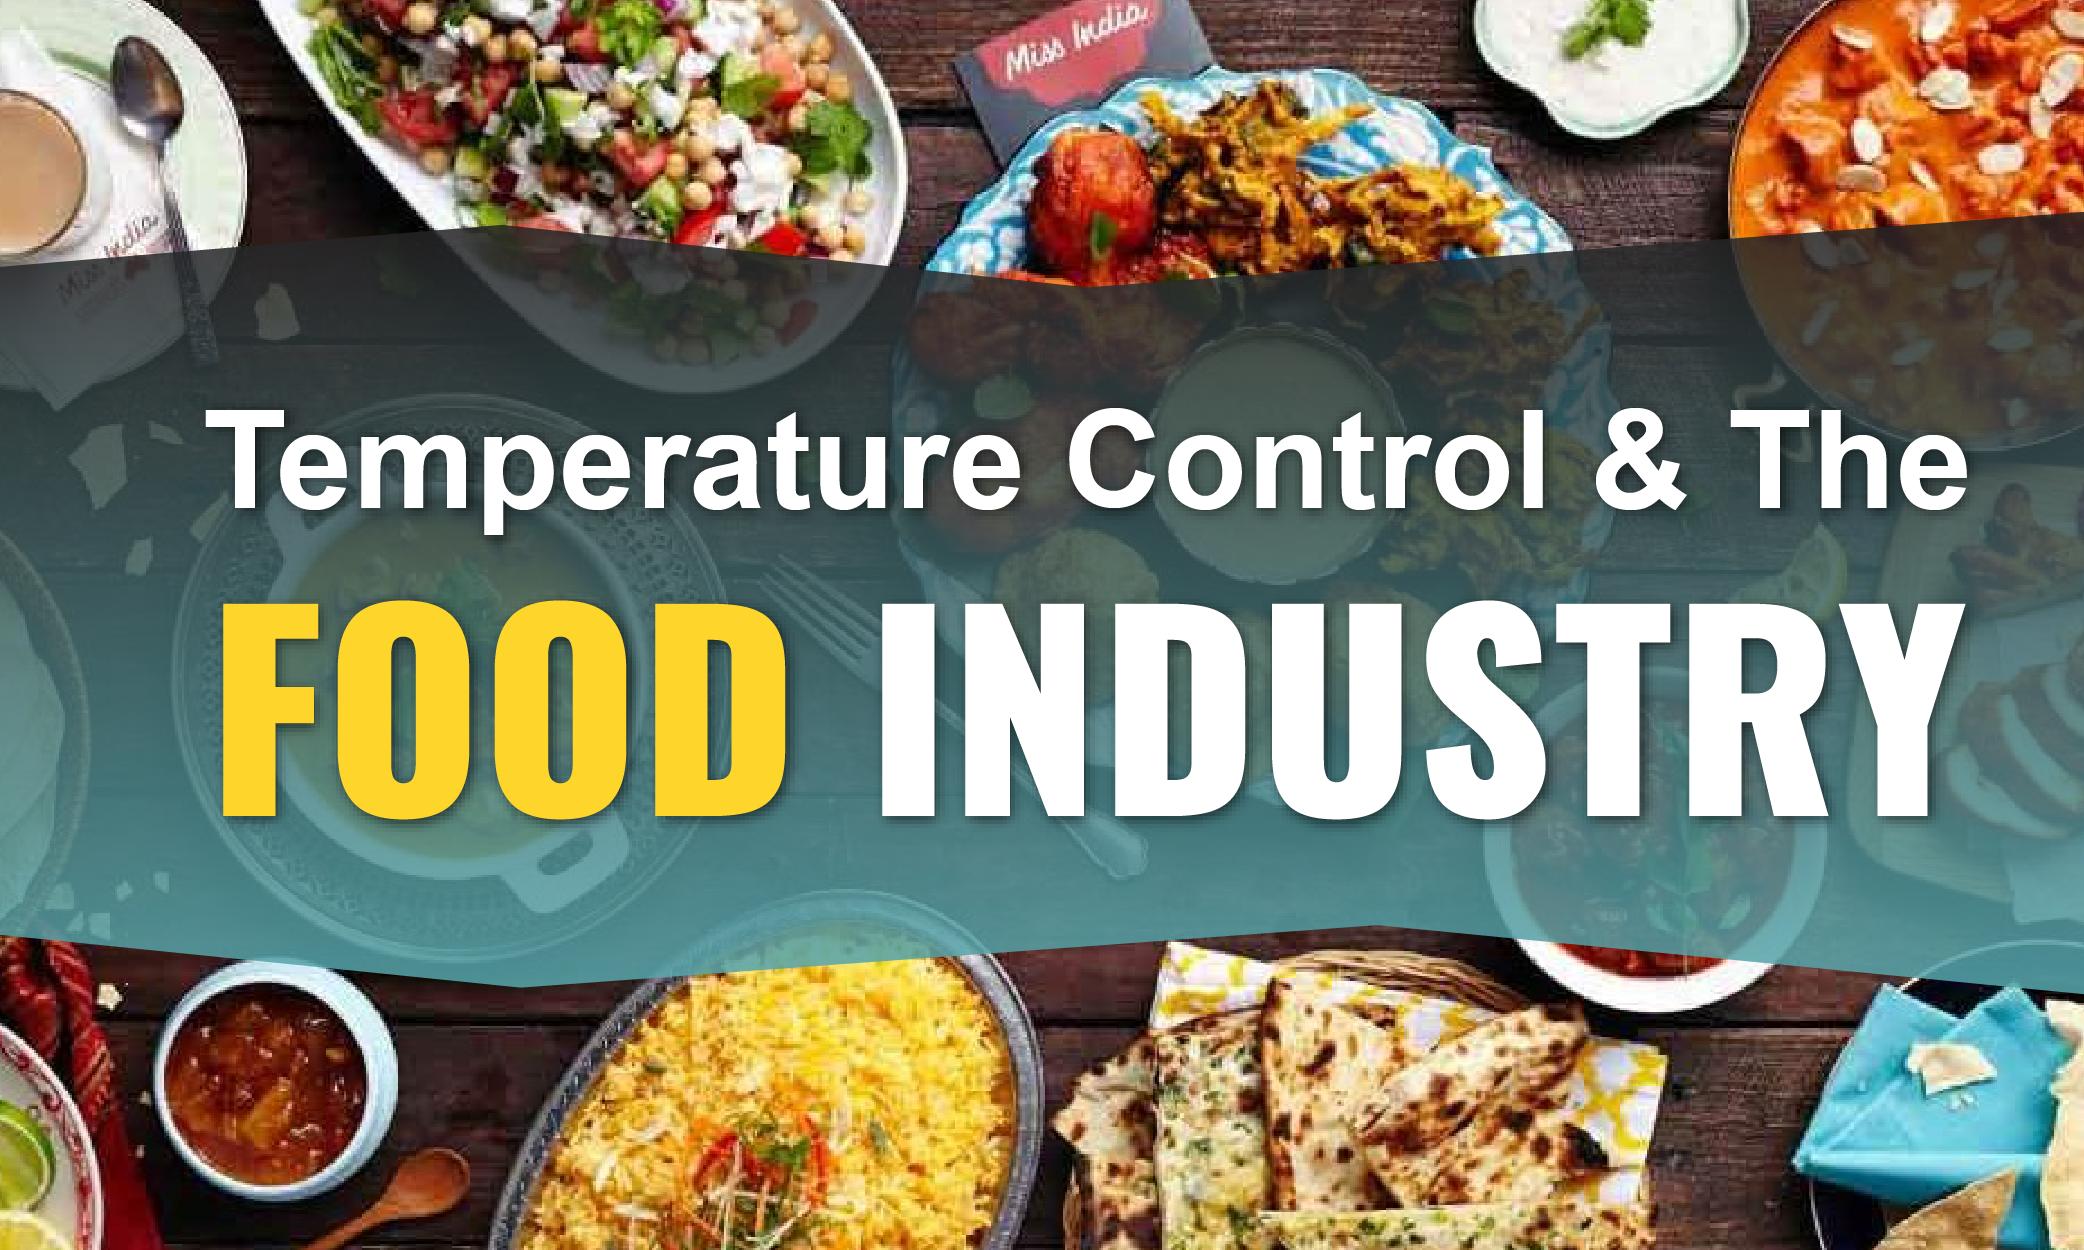 FoodIndustry-BlogGraphic-01